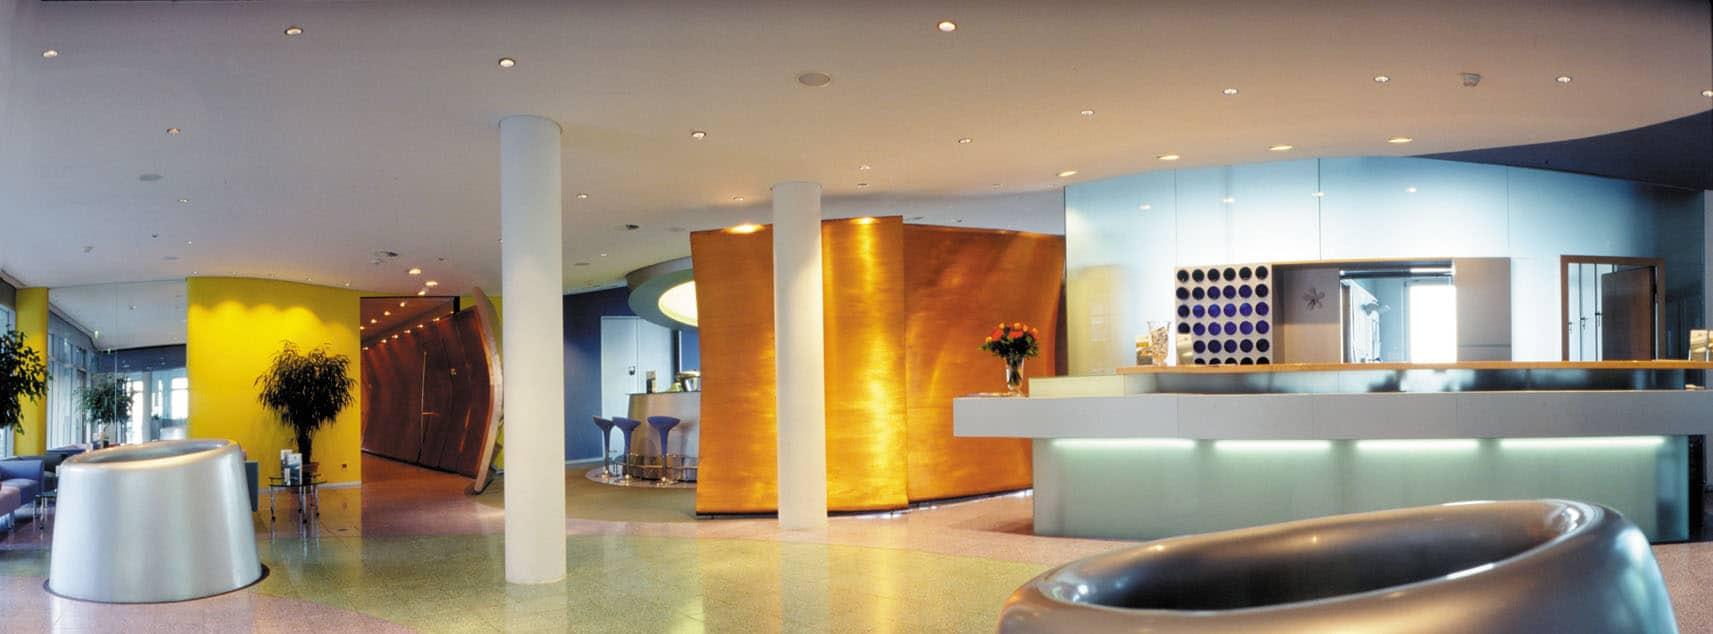 Helgoland atoll ocean resort meerjobs for Designhotel helgoland